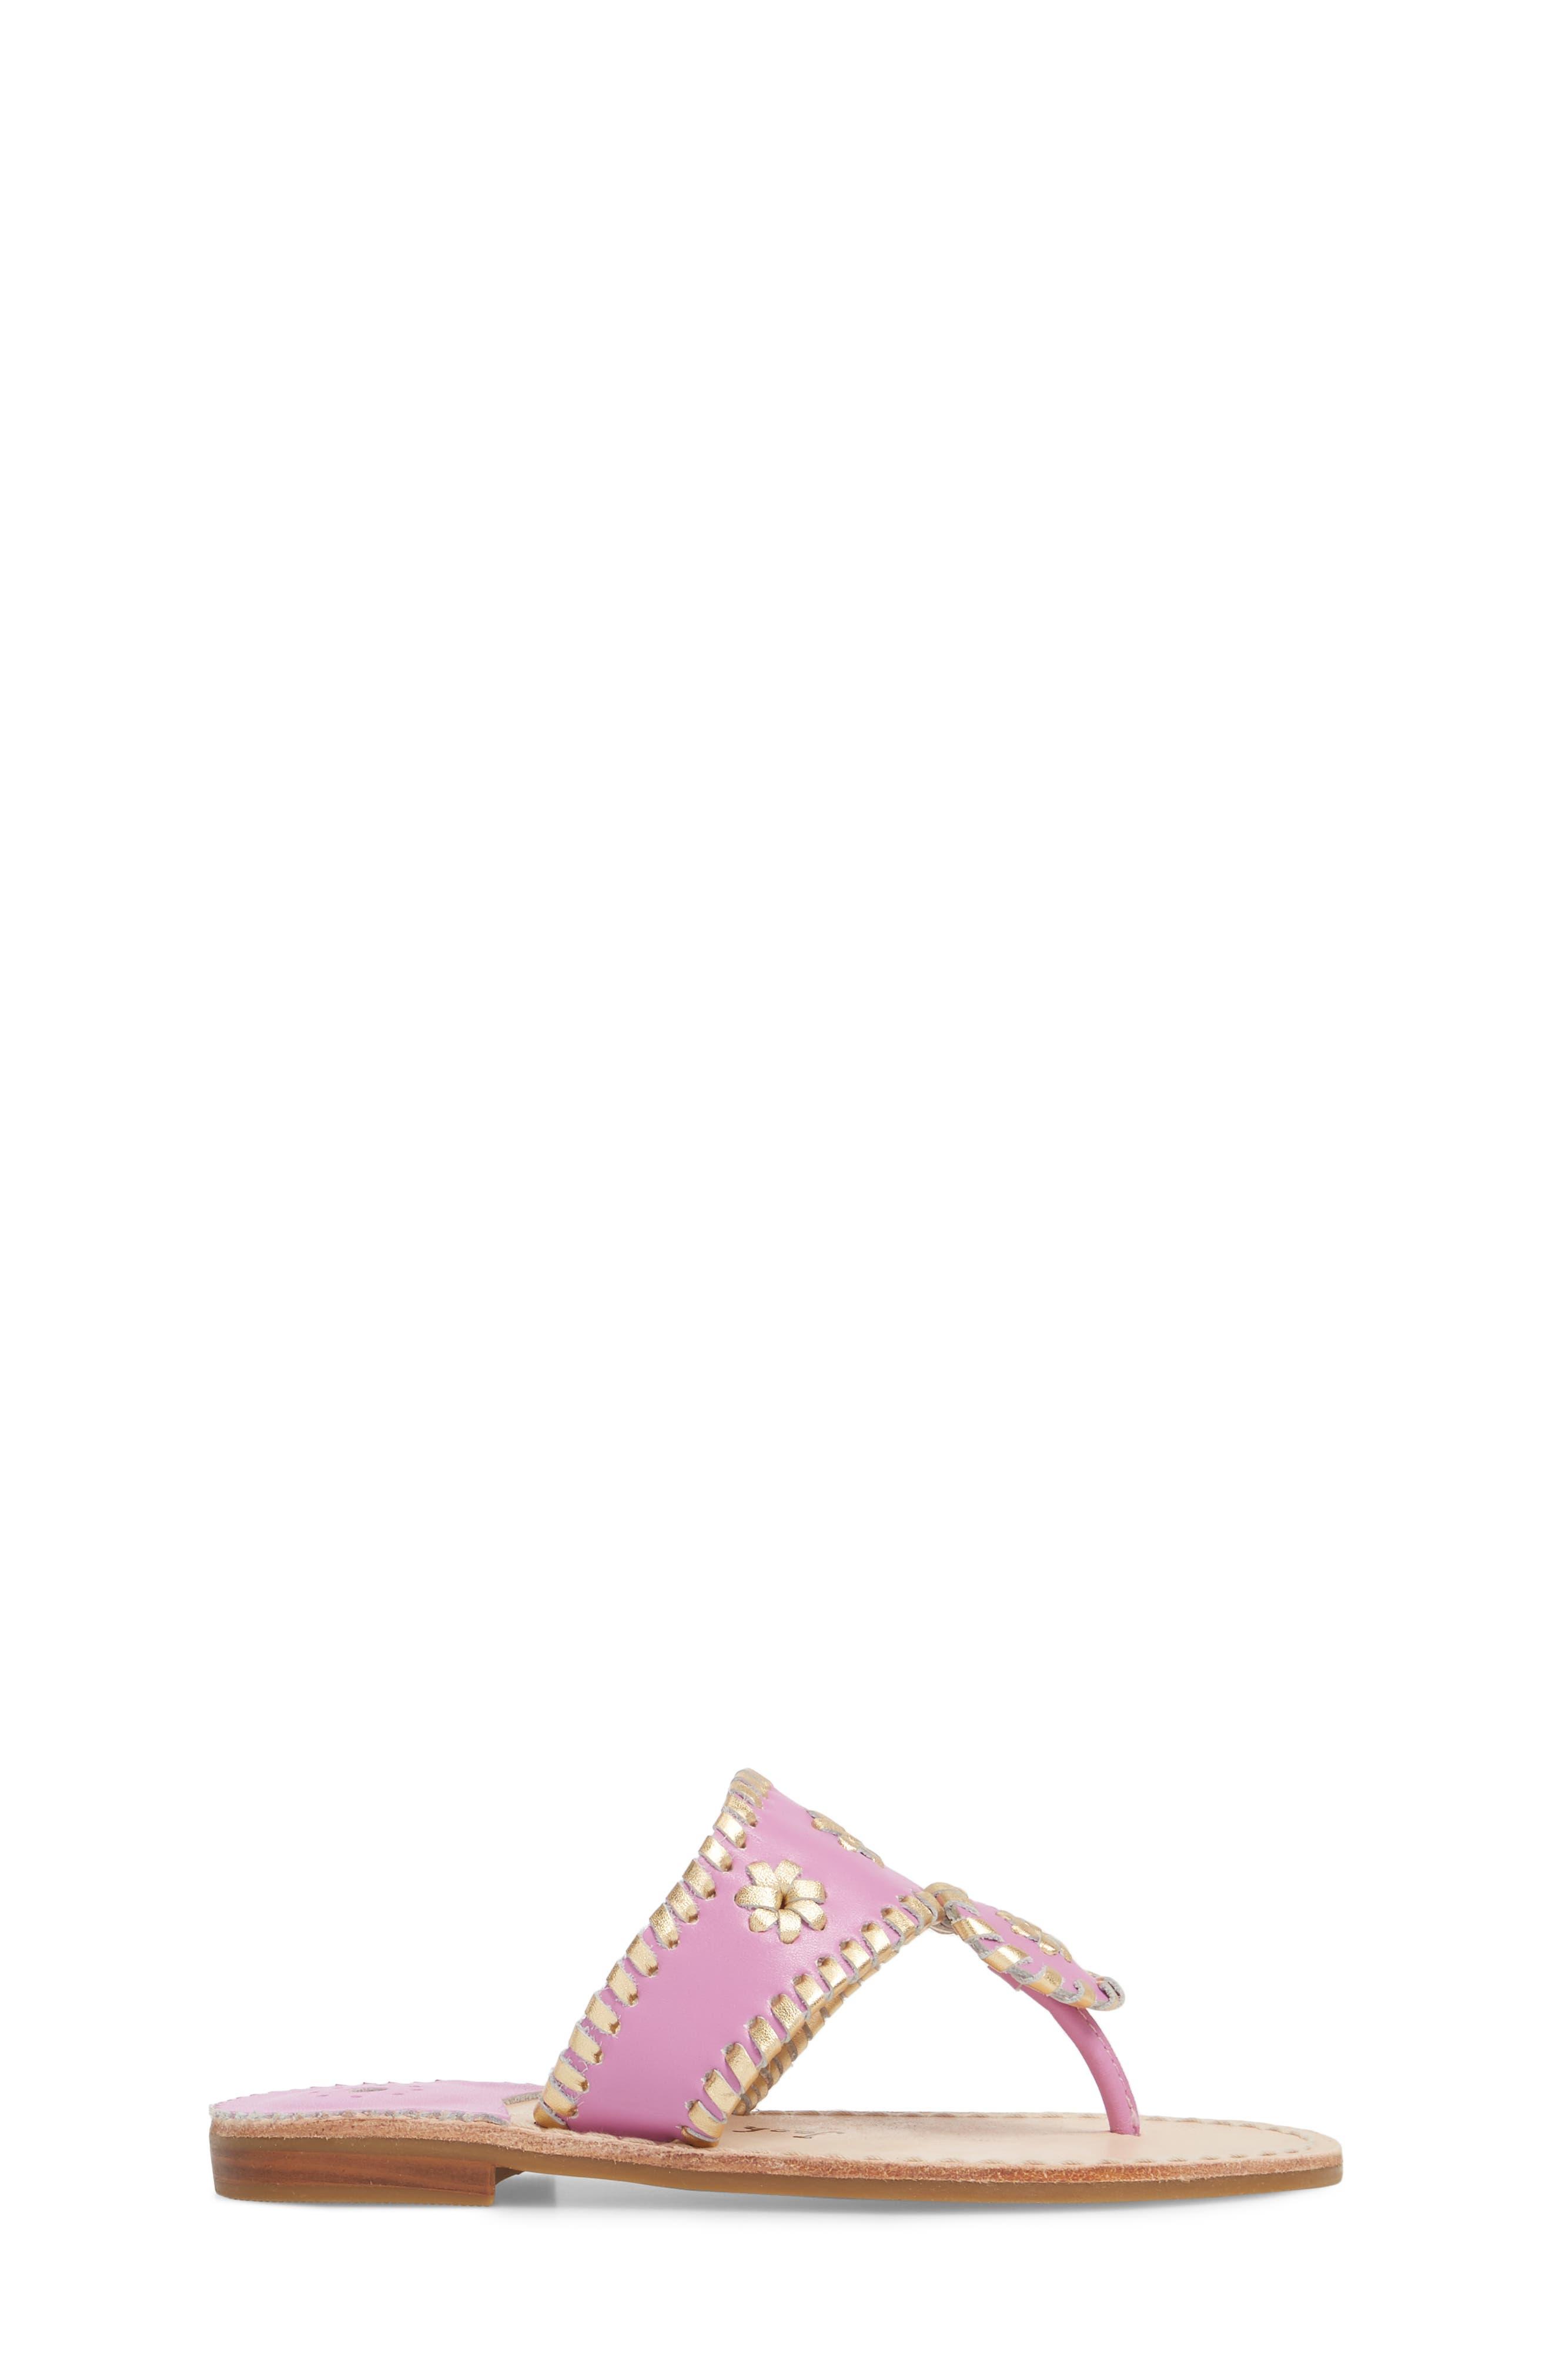 Miss Hollis Metallic Trim Thong Sandal,                             Alternate thumbnail 3, color,                             Lavender Pink/ Gold Leather